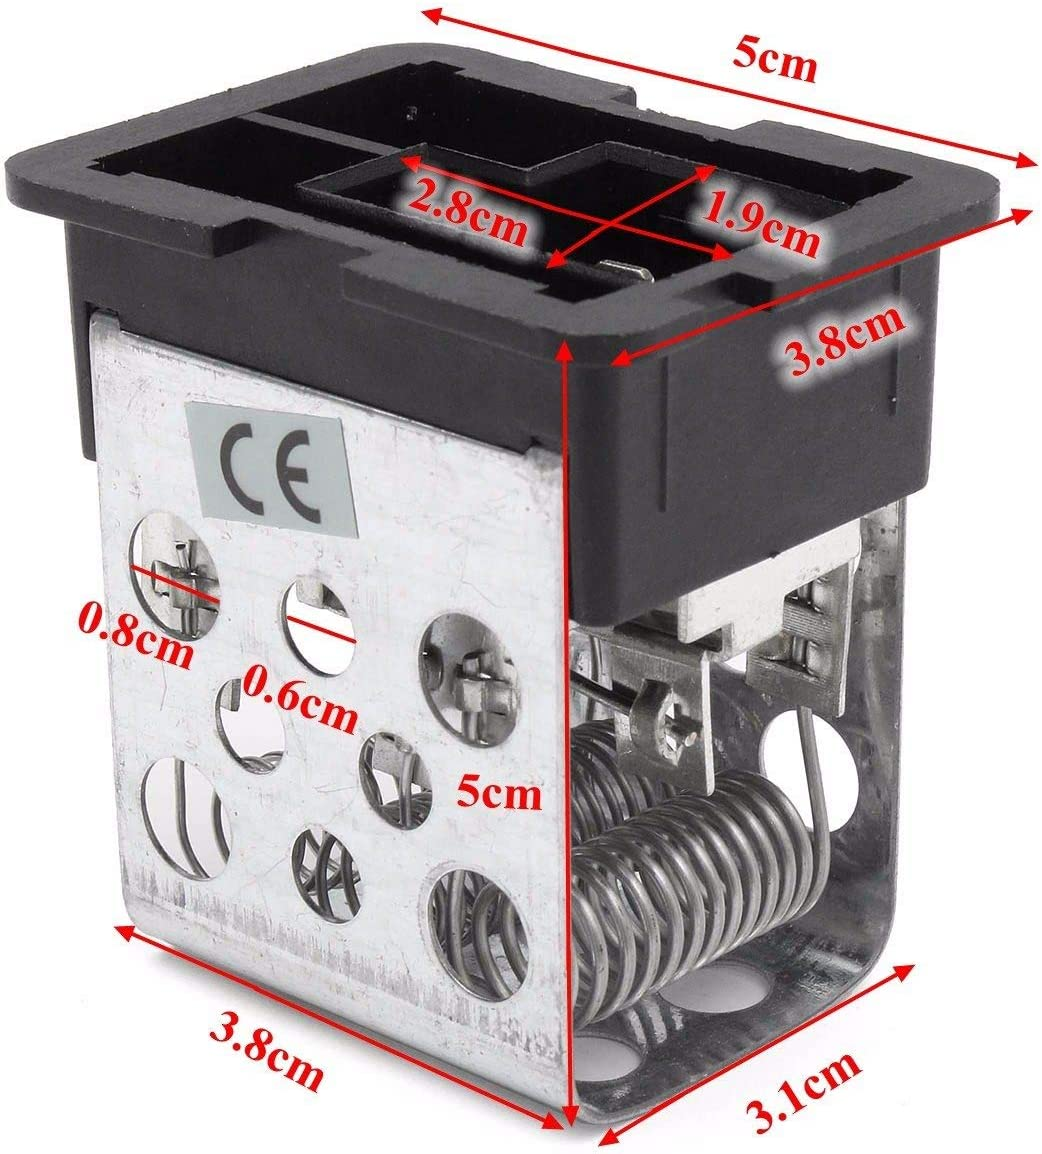 Cikuso Car Resistenza del Ventilatore del Motore del Ventilatore di Riscaldamento per Vauxhall Astra H Mk5 2004 2005 2006 2007 2008-2011 90560362